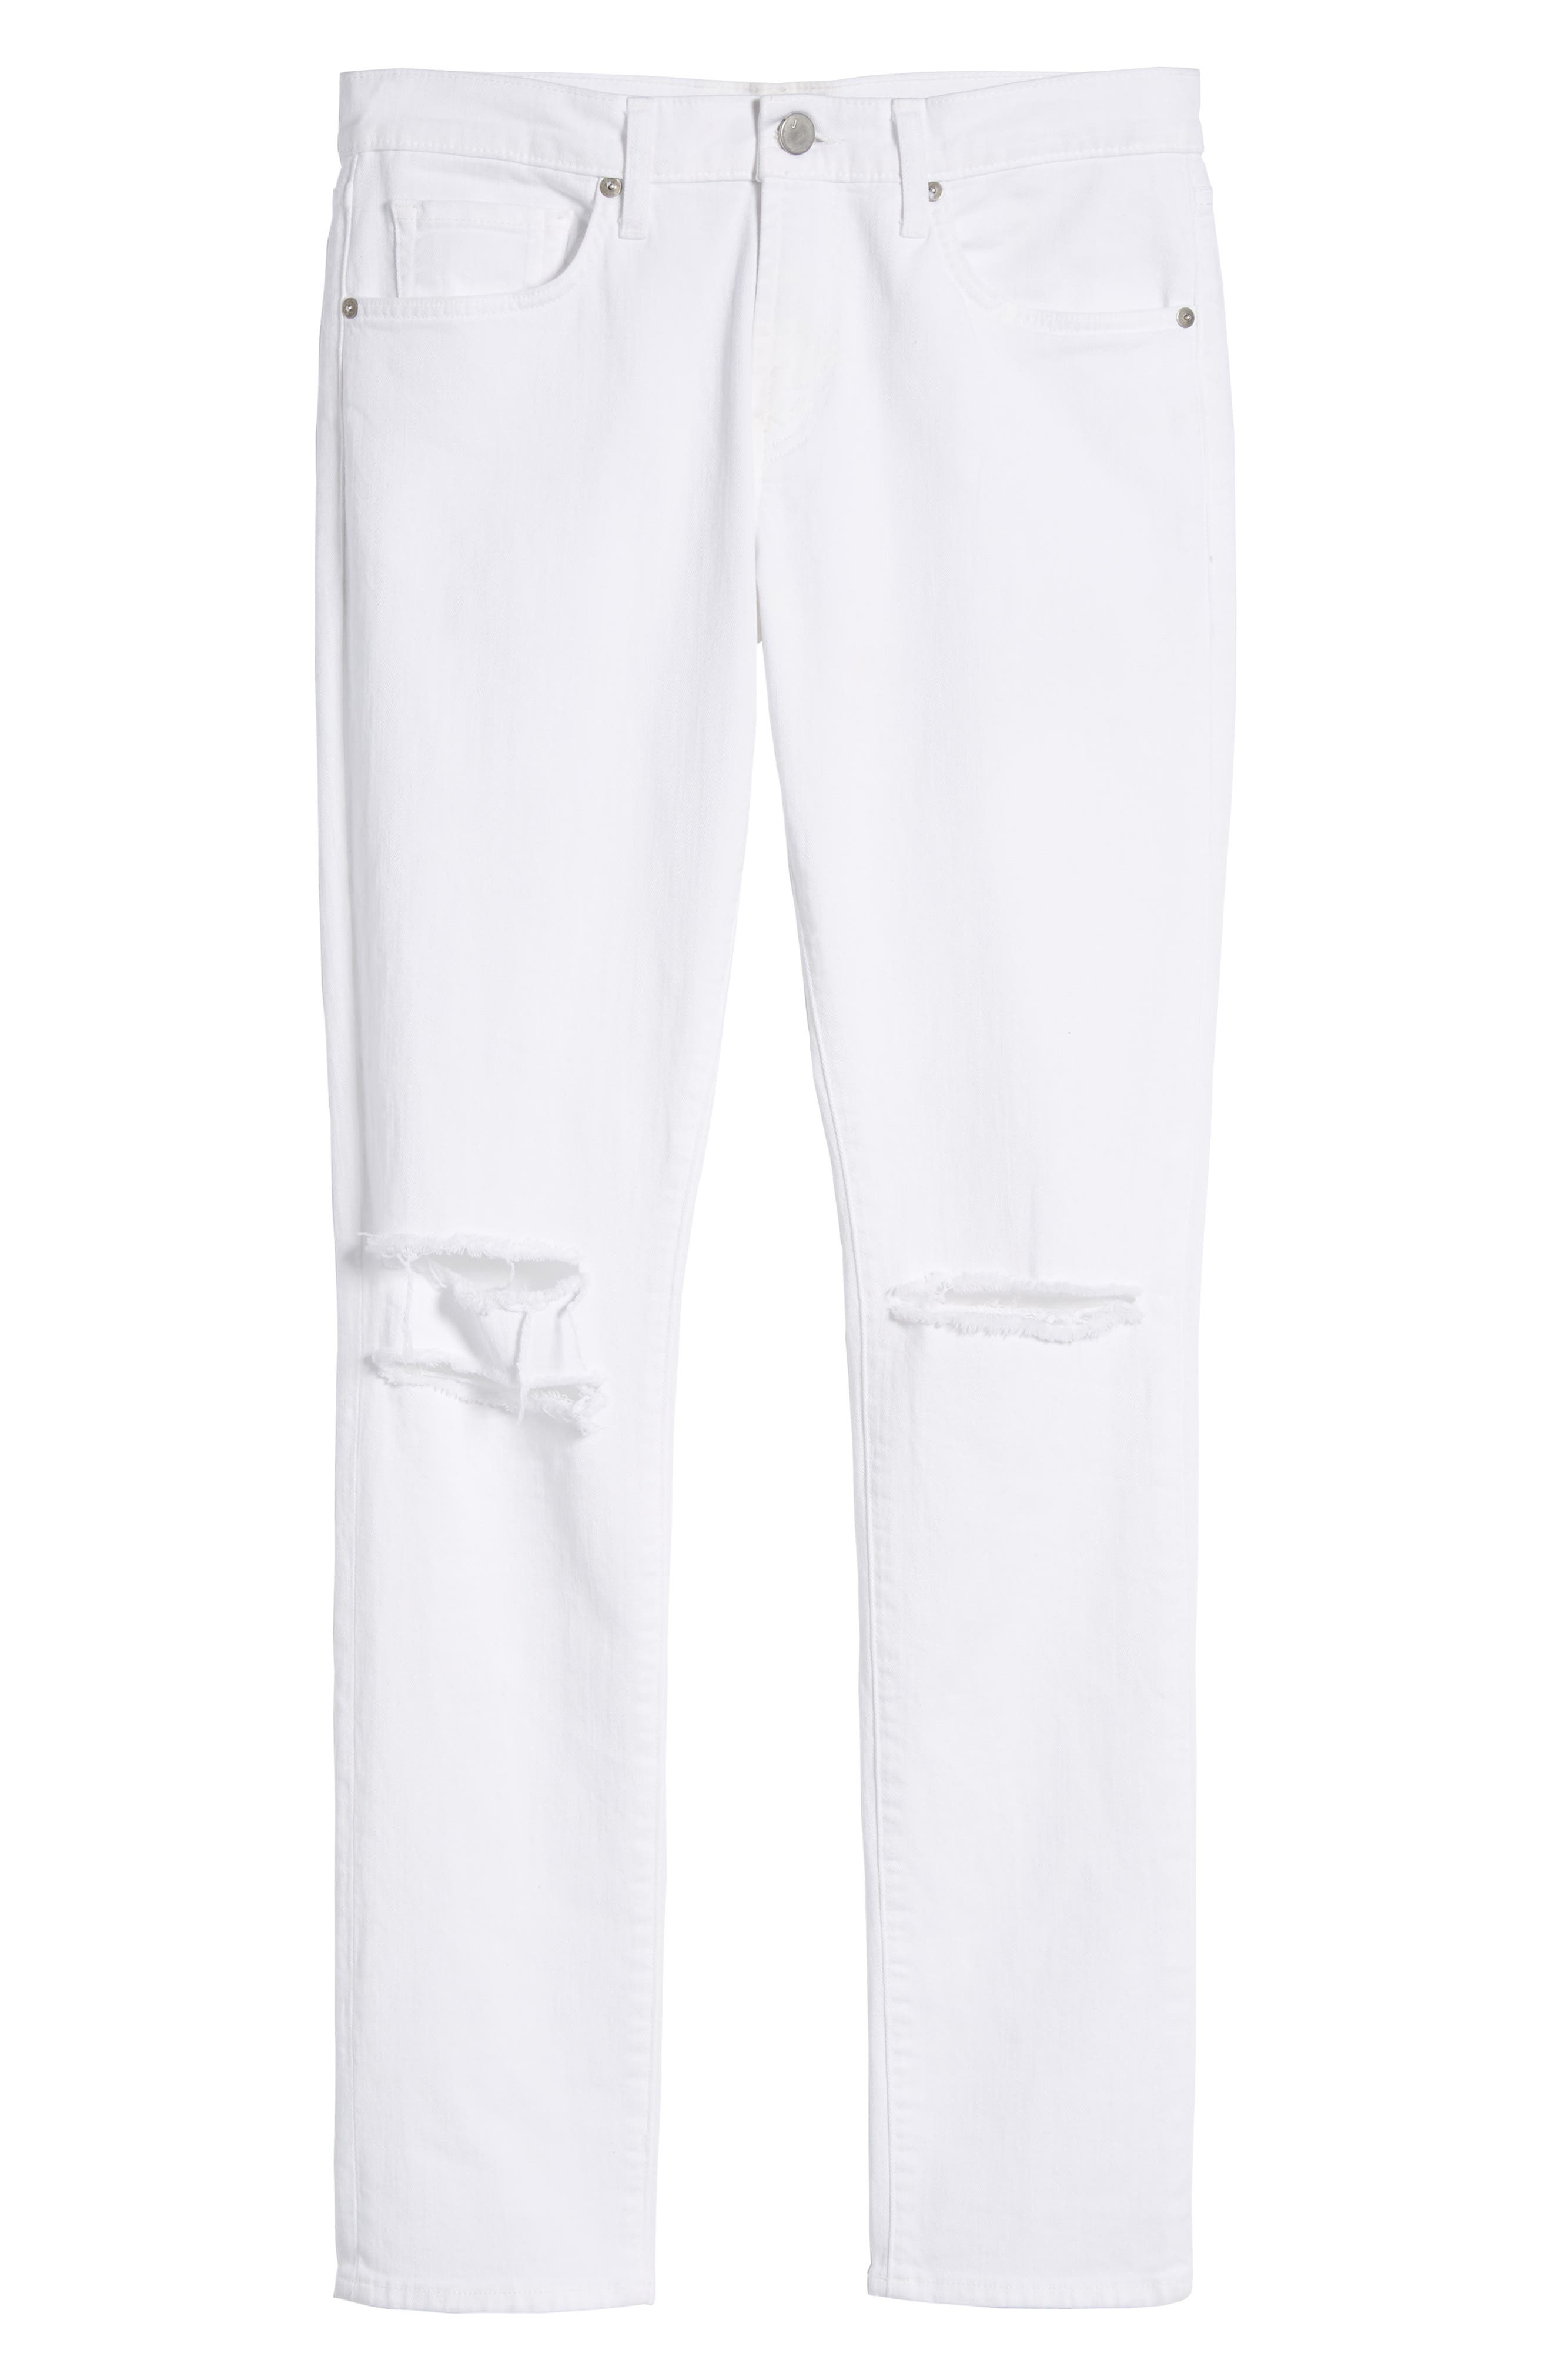 Mick Distressed Skinny Fit Jeans,                             Alternate thumbnail 6, color,                             WHITMAN OAK